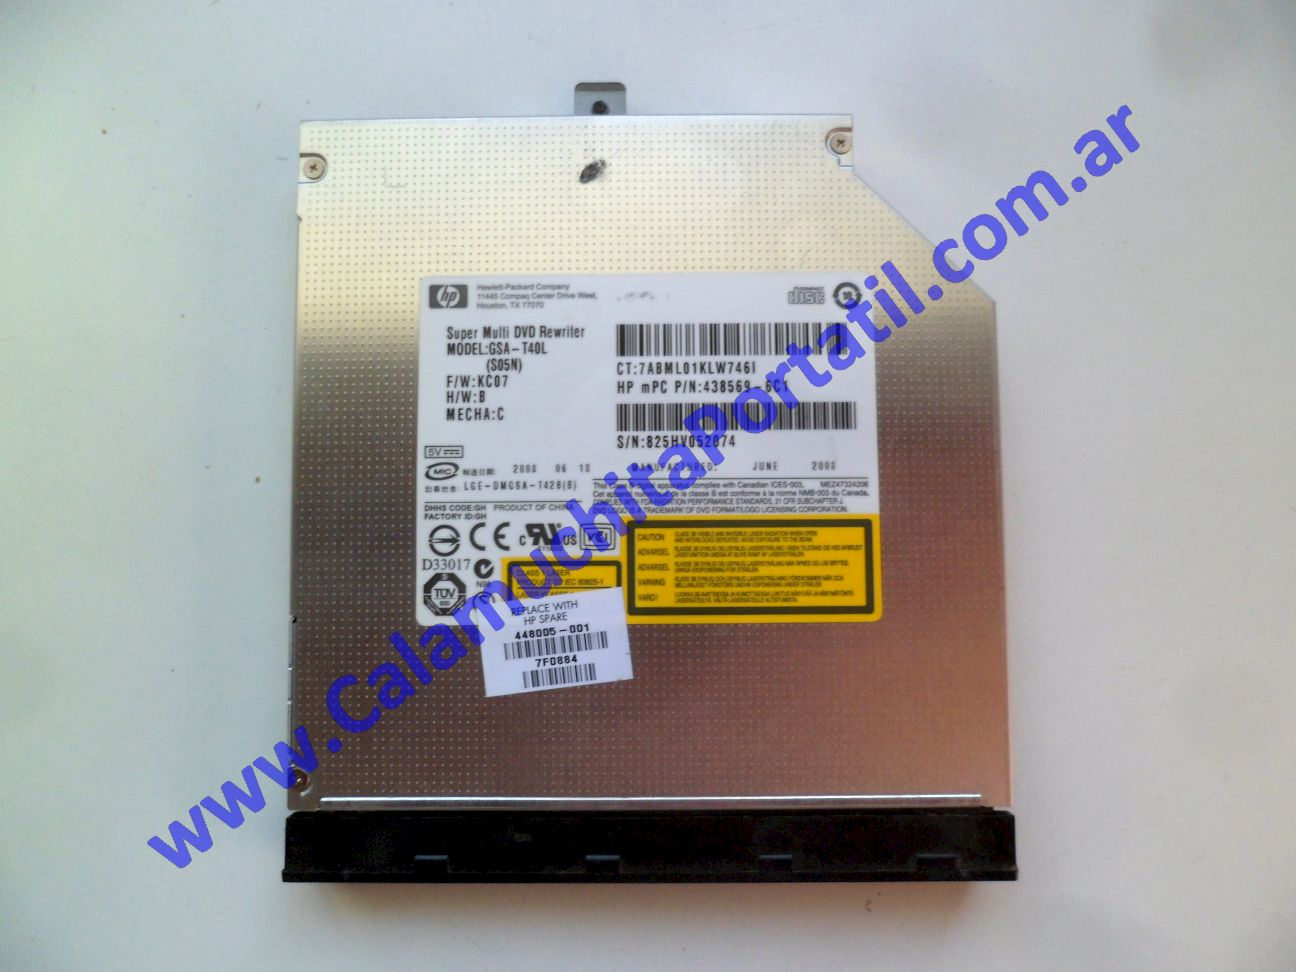 0620OPT Optico Hewlett Packard Pavillion dv9000 / dv9700 / dv9910us / FE694UA#ABA